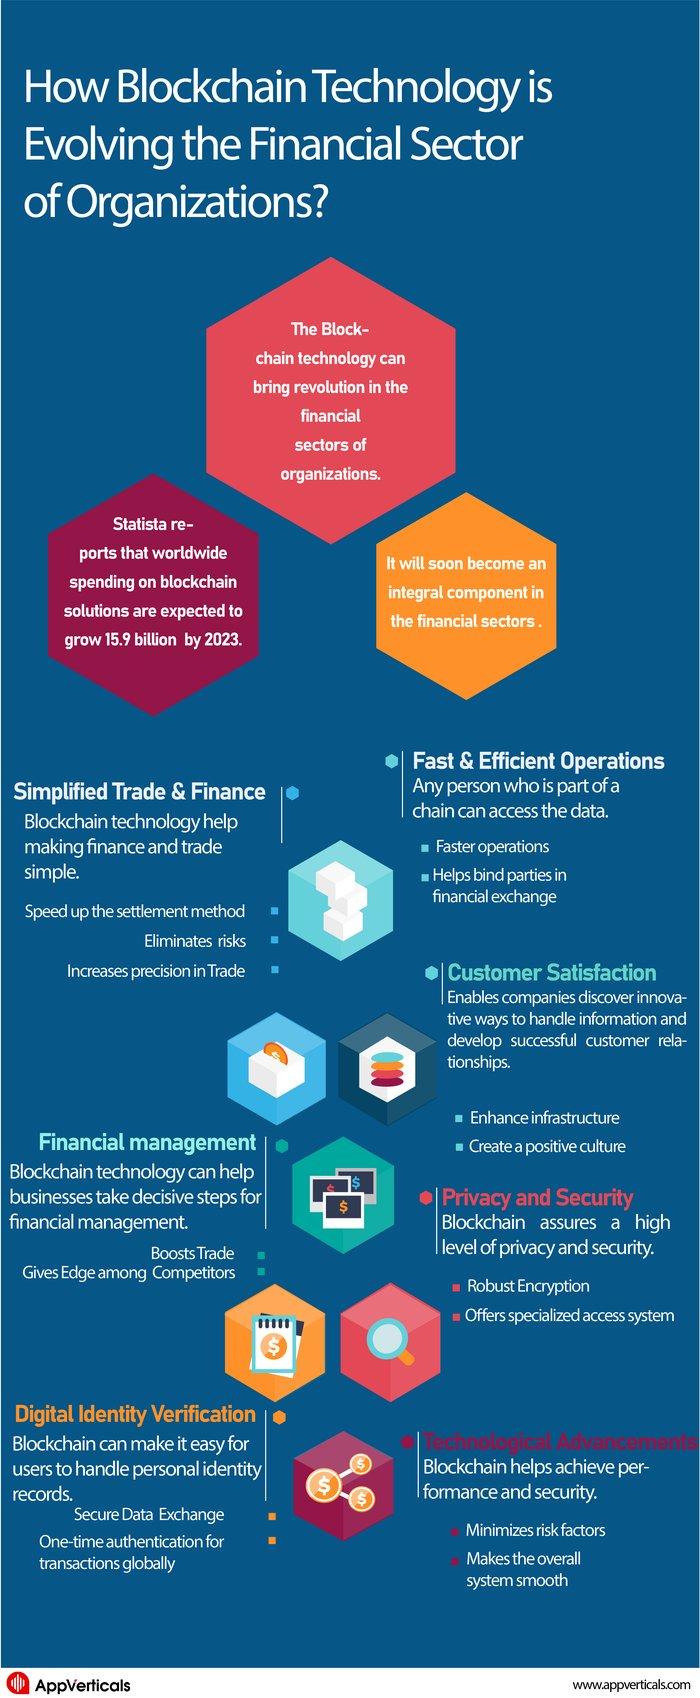 How Blockchain Technology is Evolving Organizations?